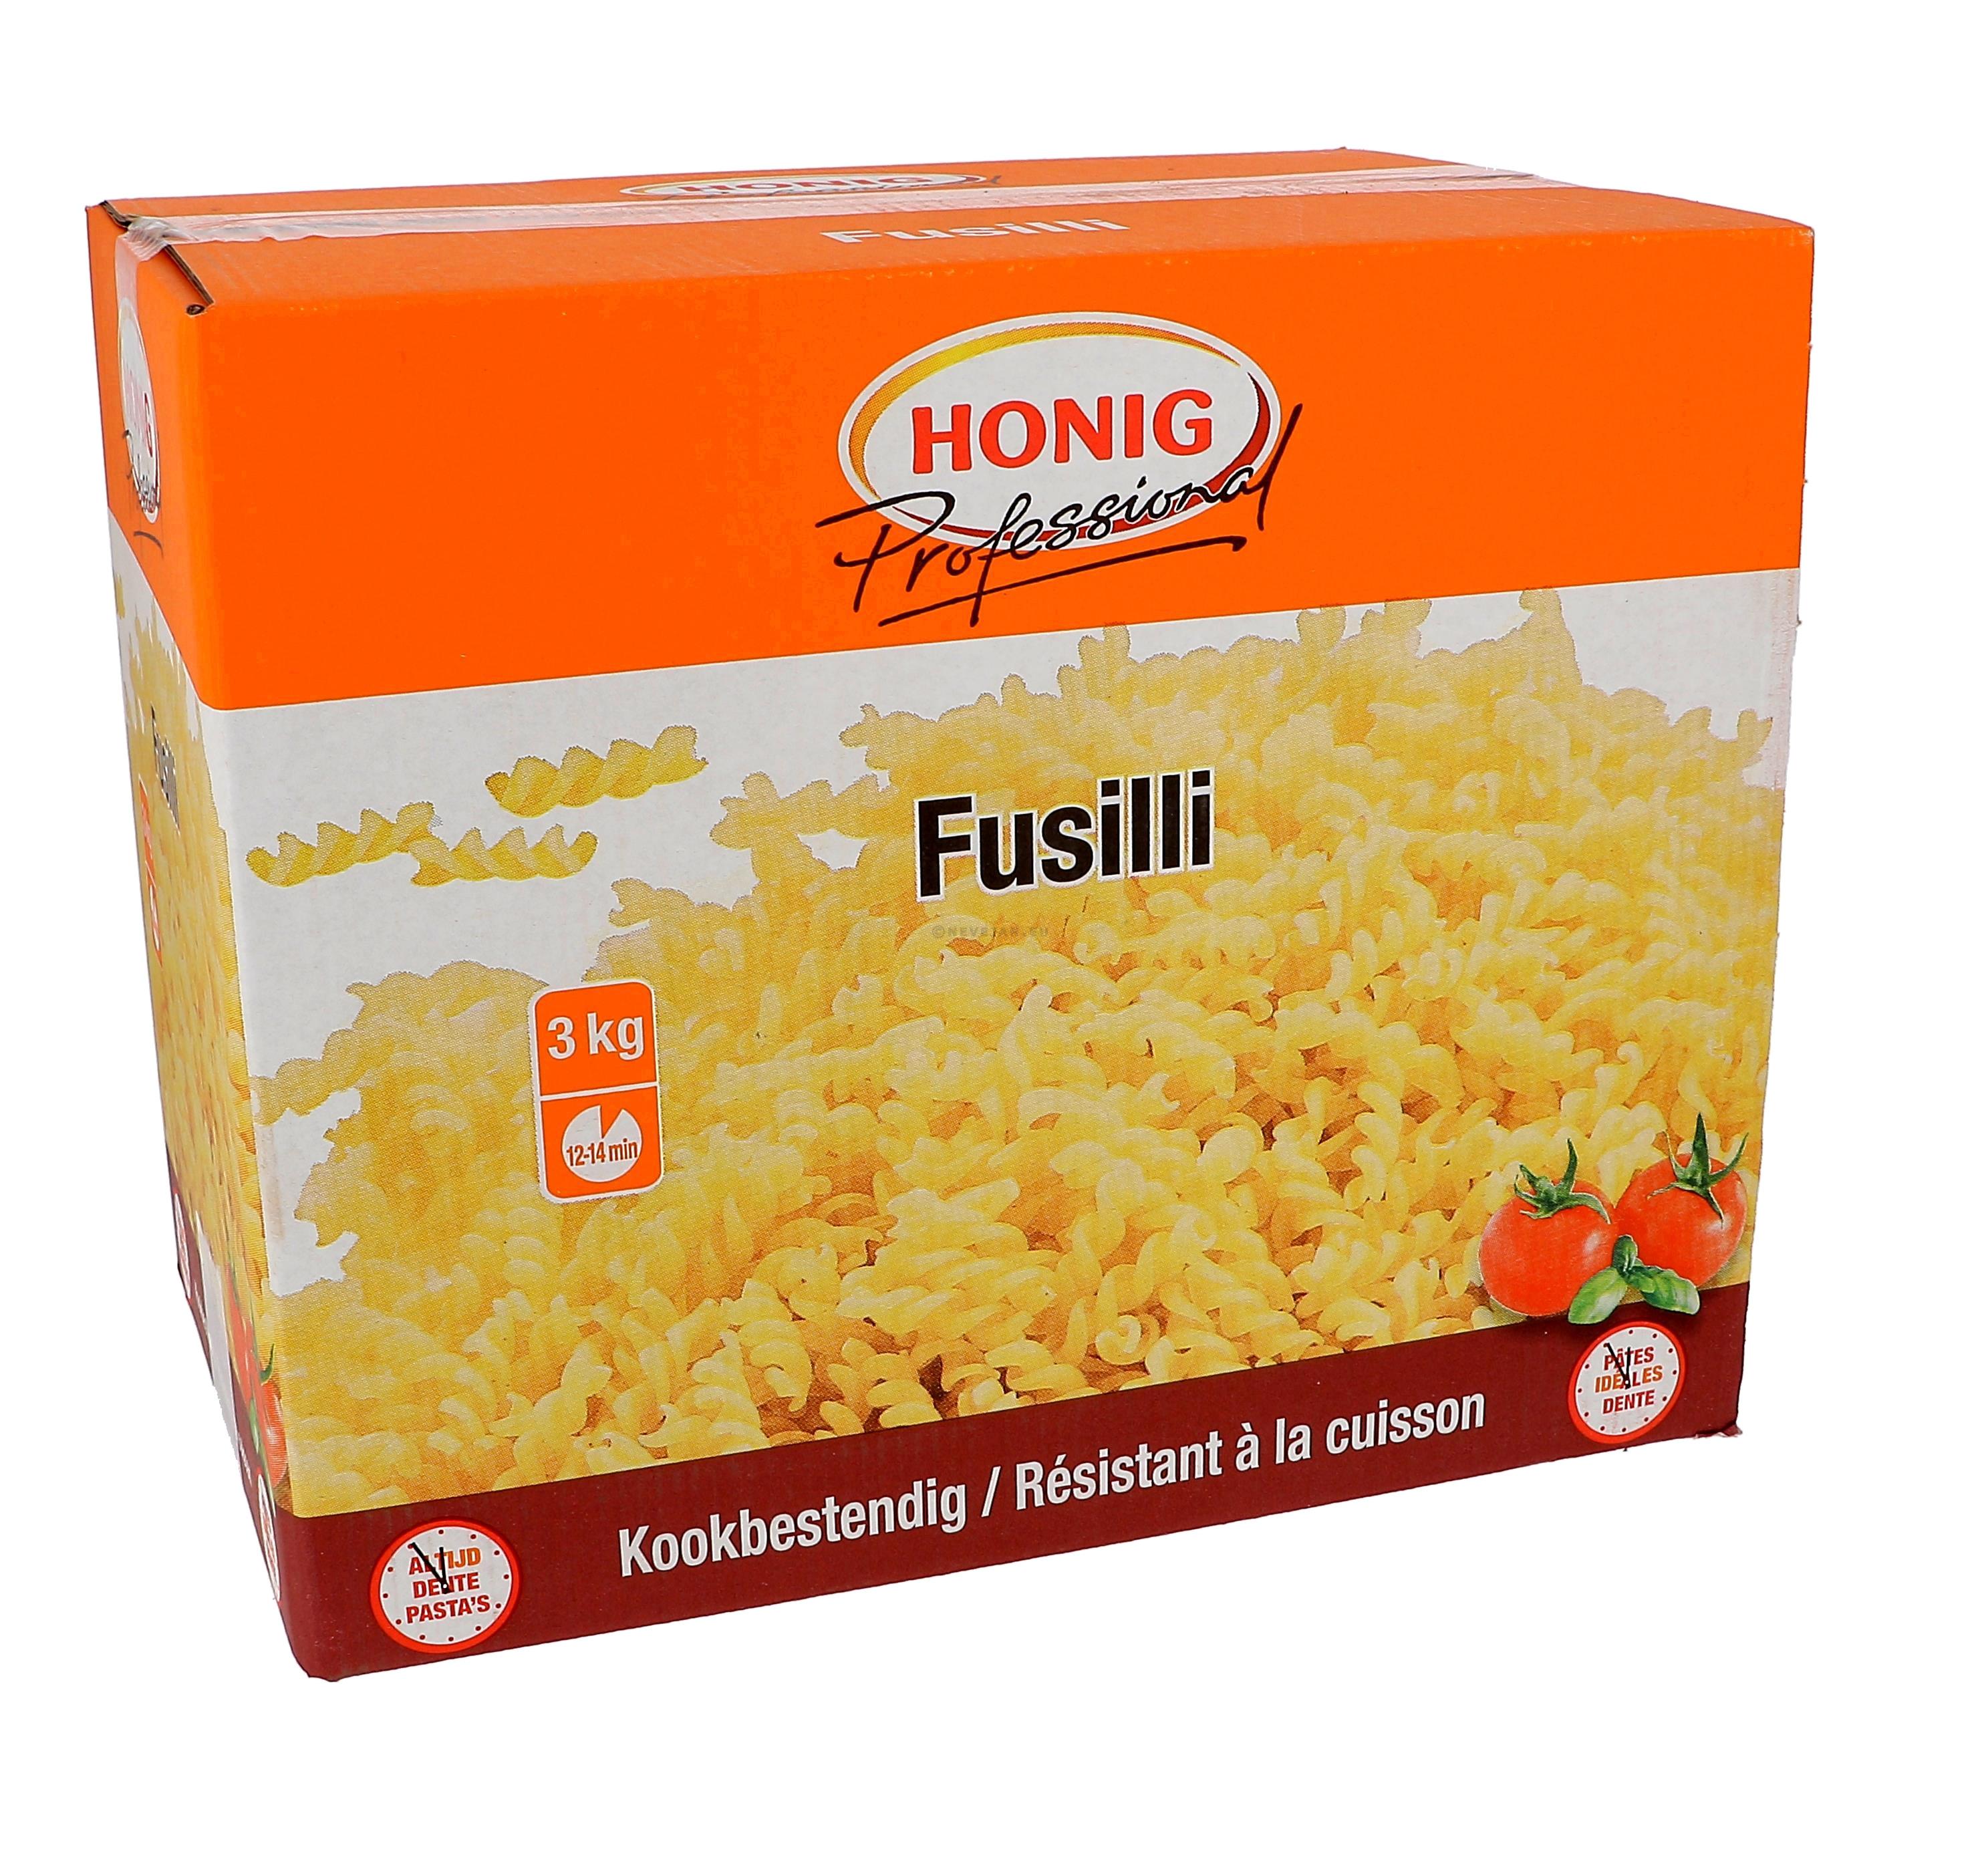 Honig fusilli pasta naturel 3kg Professional kookbestendig